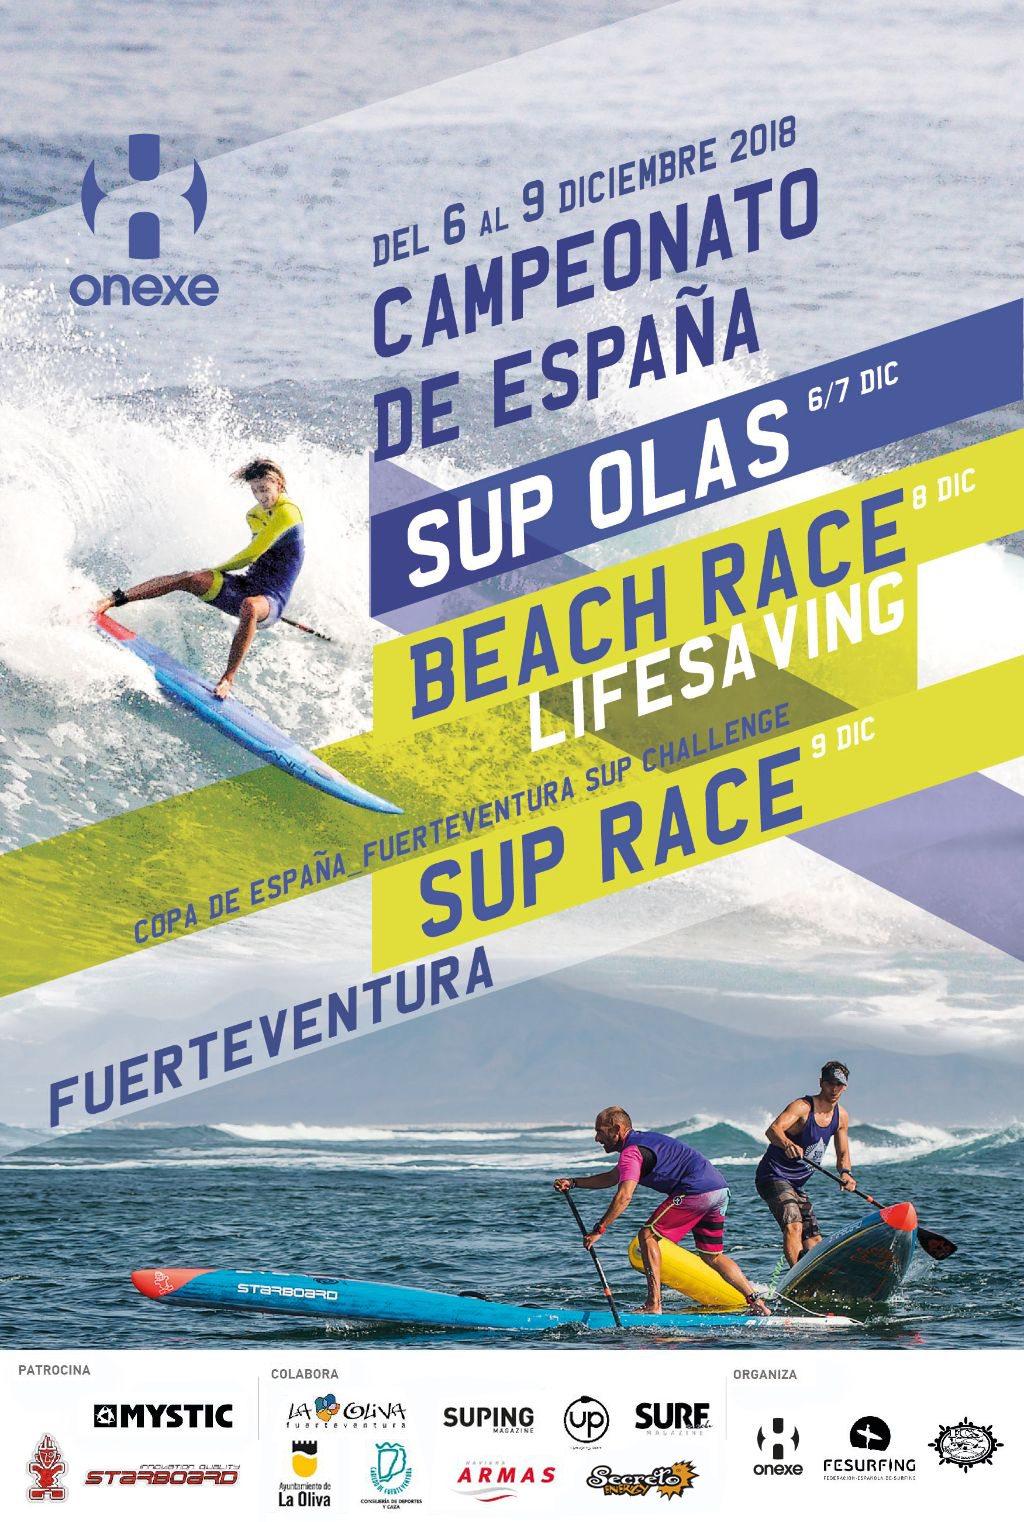 CAMPEONATO DE ESPAÑA FUERTEVENTURA SUP CHALLENGE  WAVES & RACE 2018 - Inscríbete